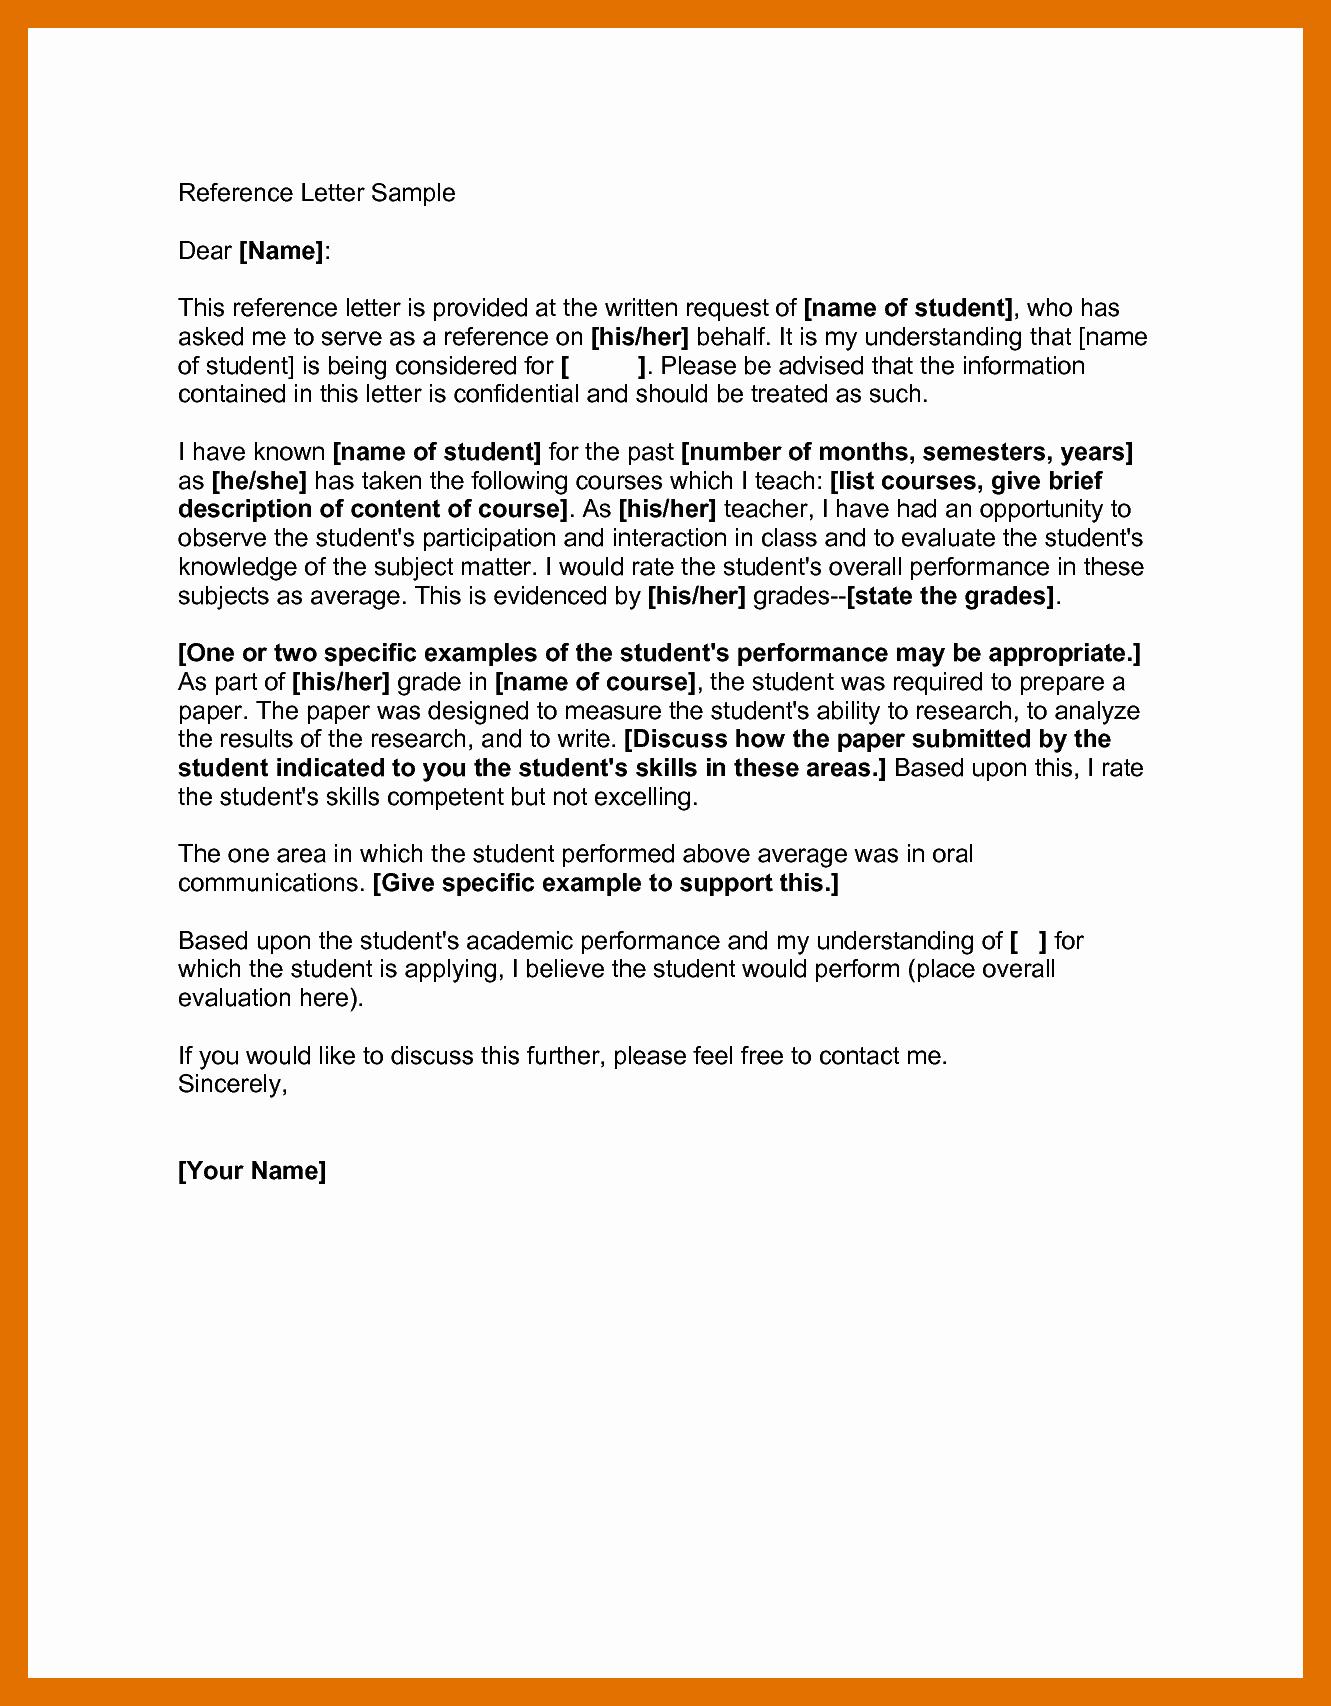 Letter Of Recommendation for Adoption Lovely 3 4 Letter Of Re Mendation for Adoption